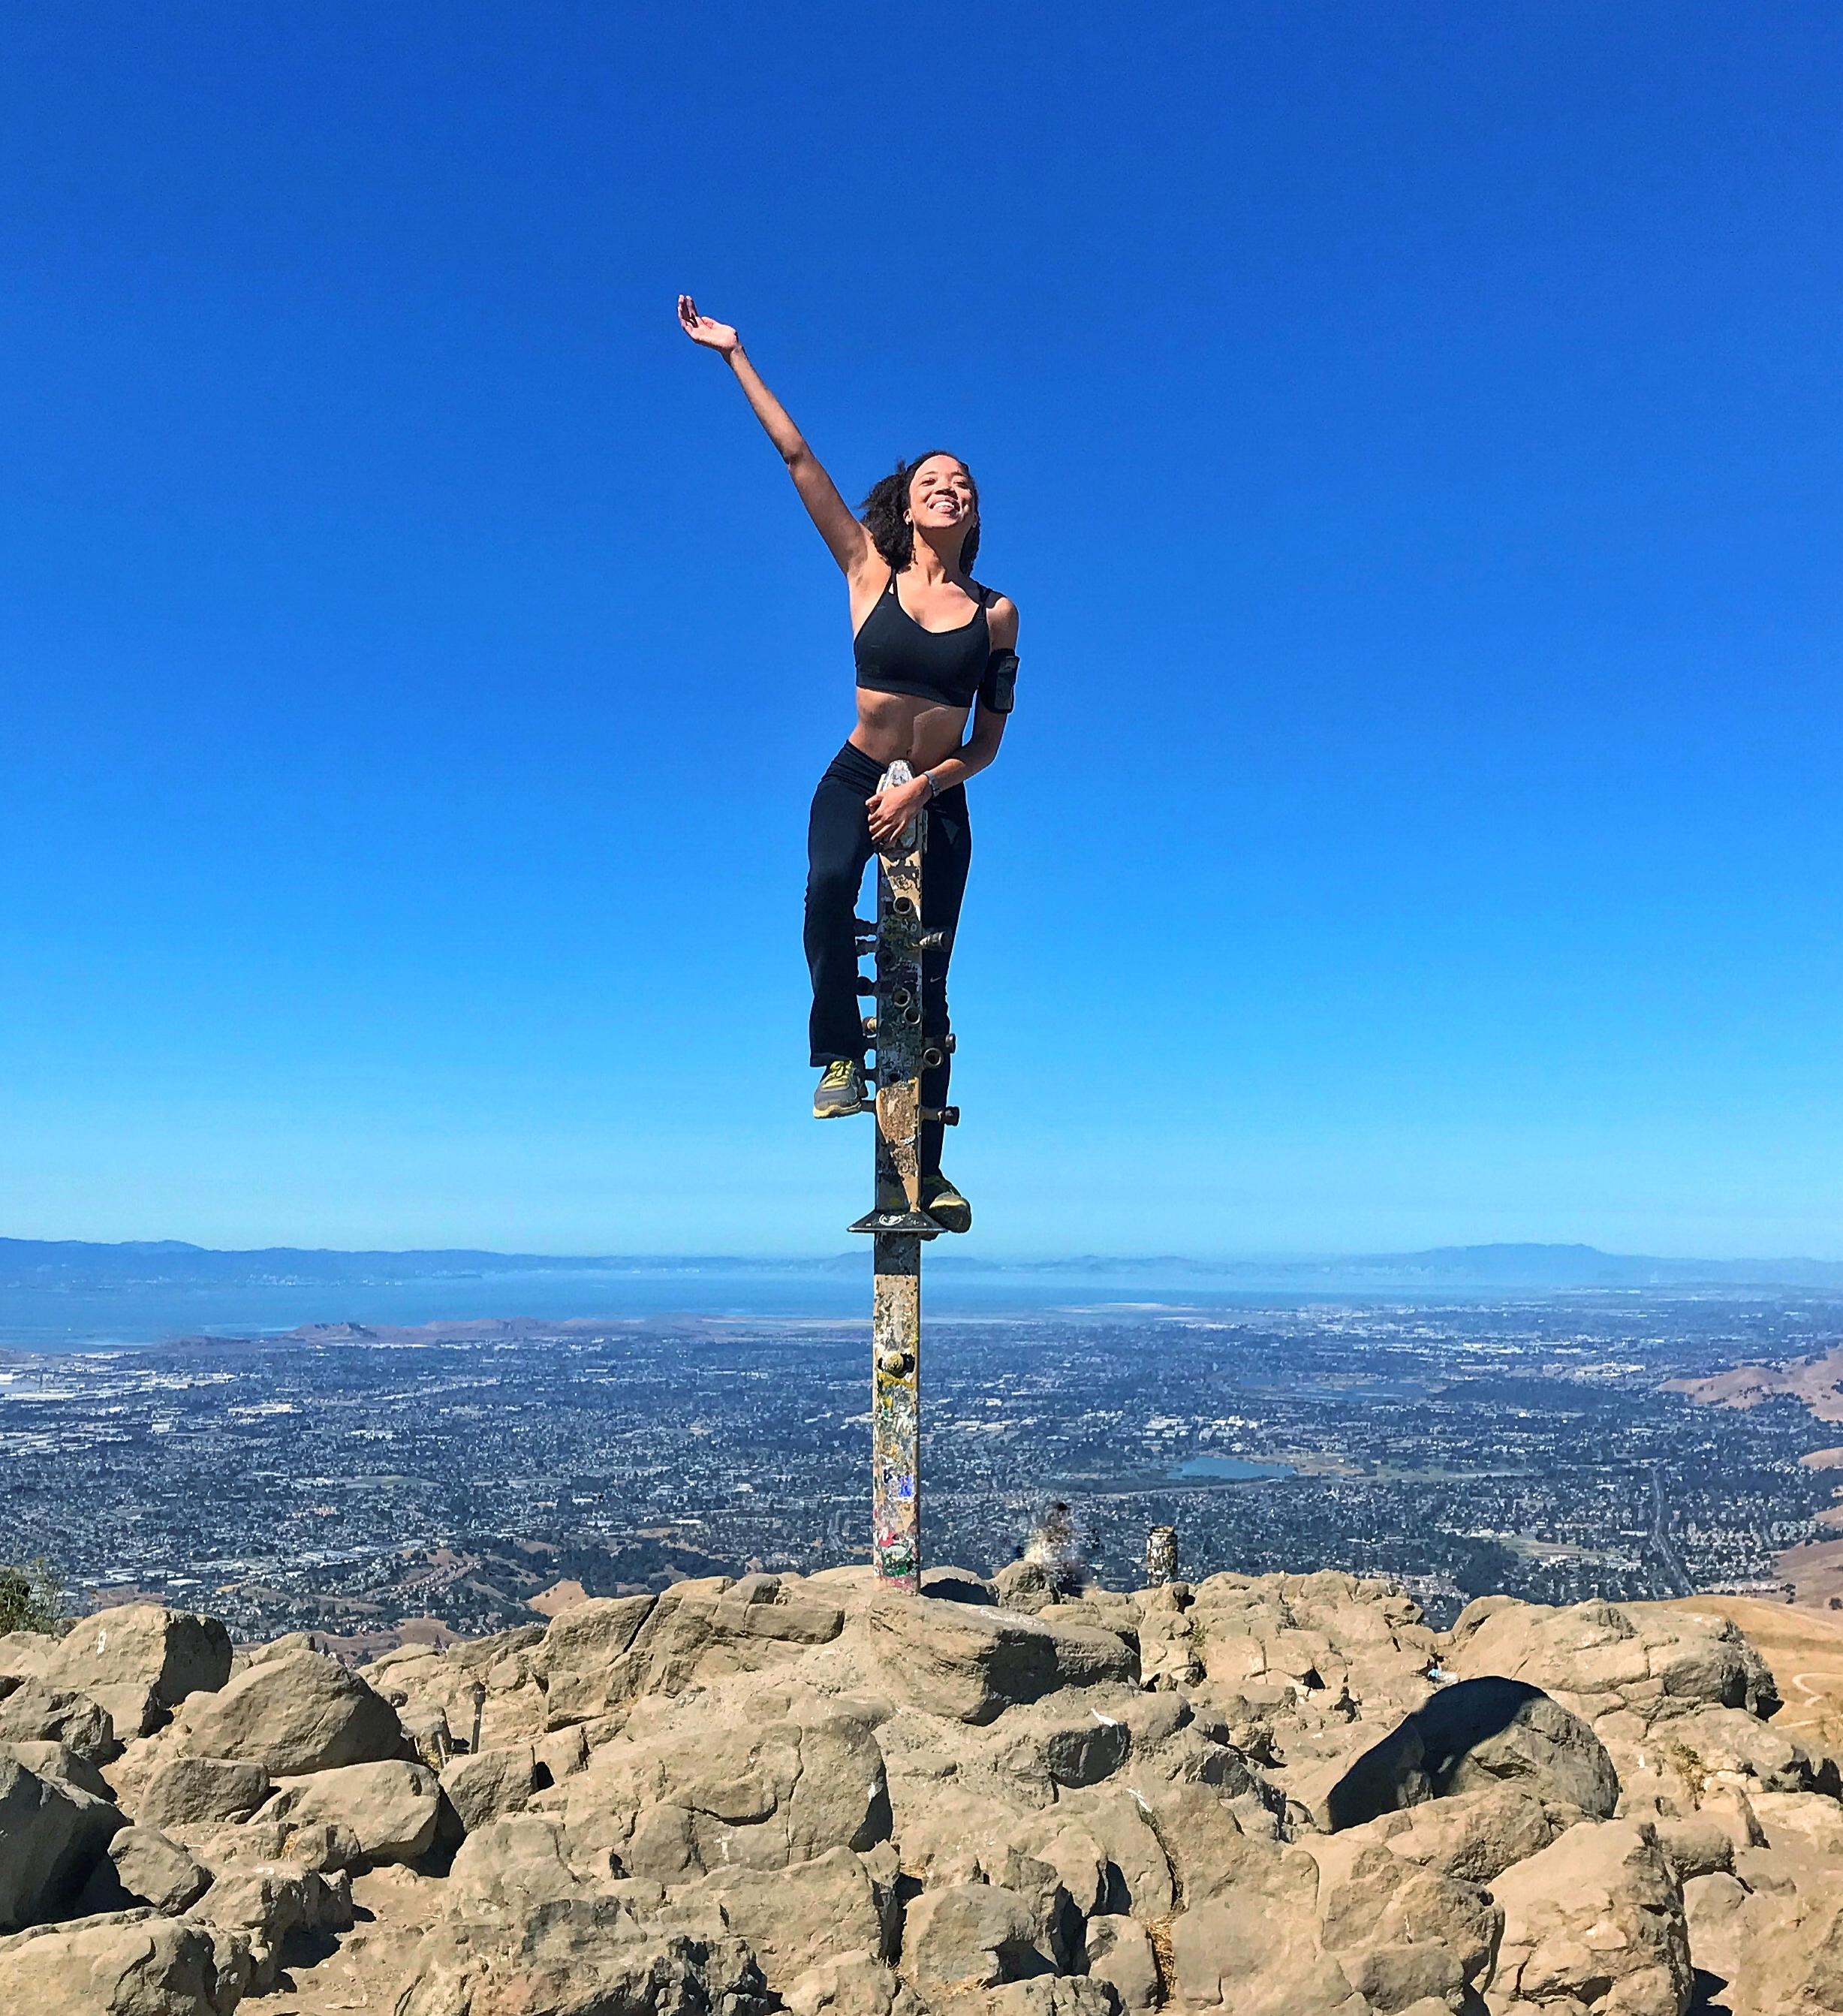 Reaching the Mission Peak Summit